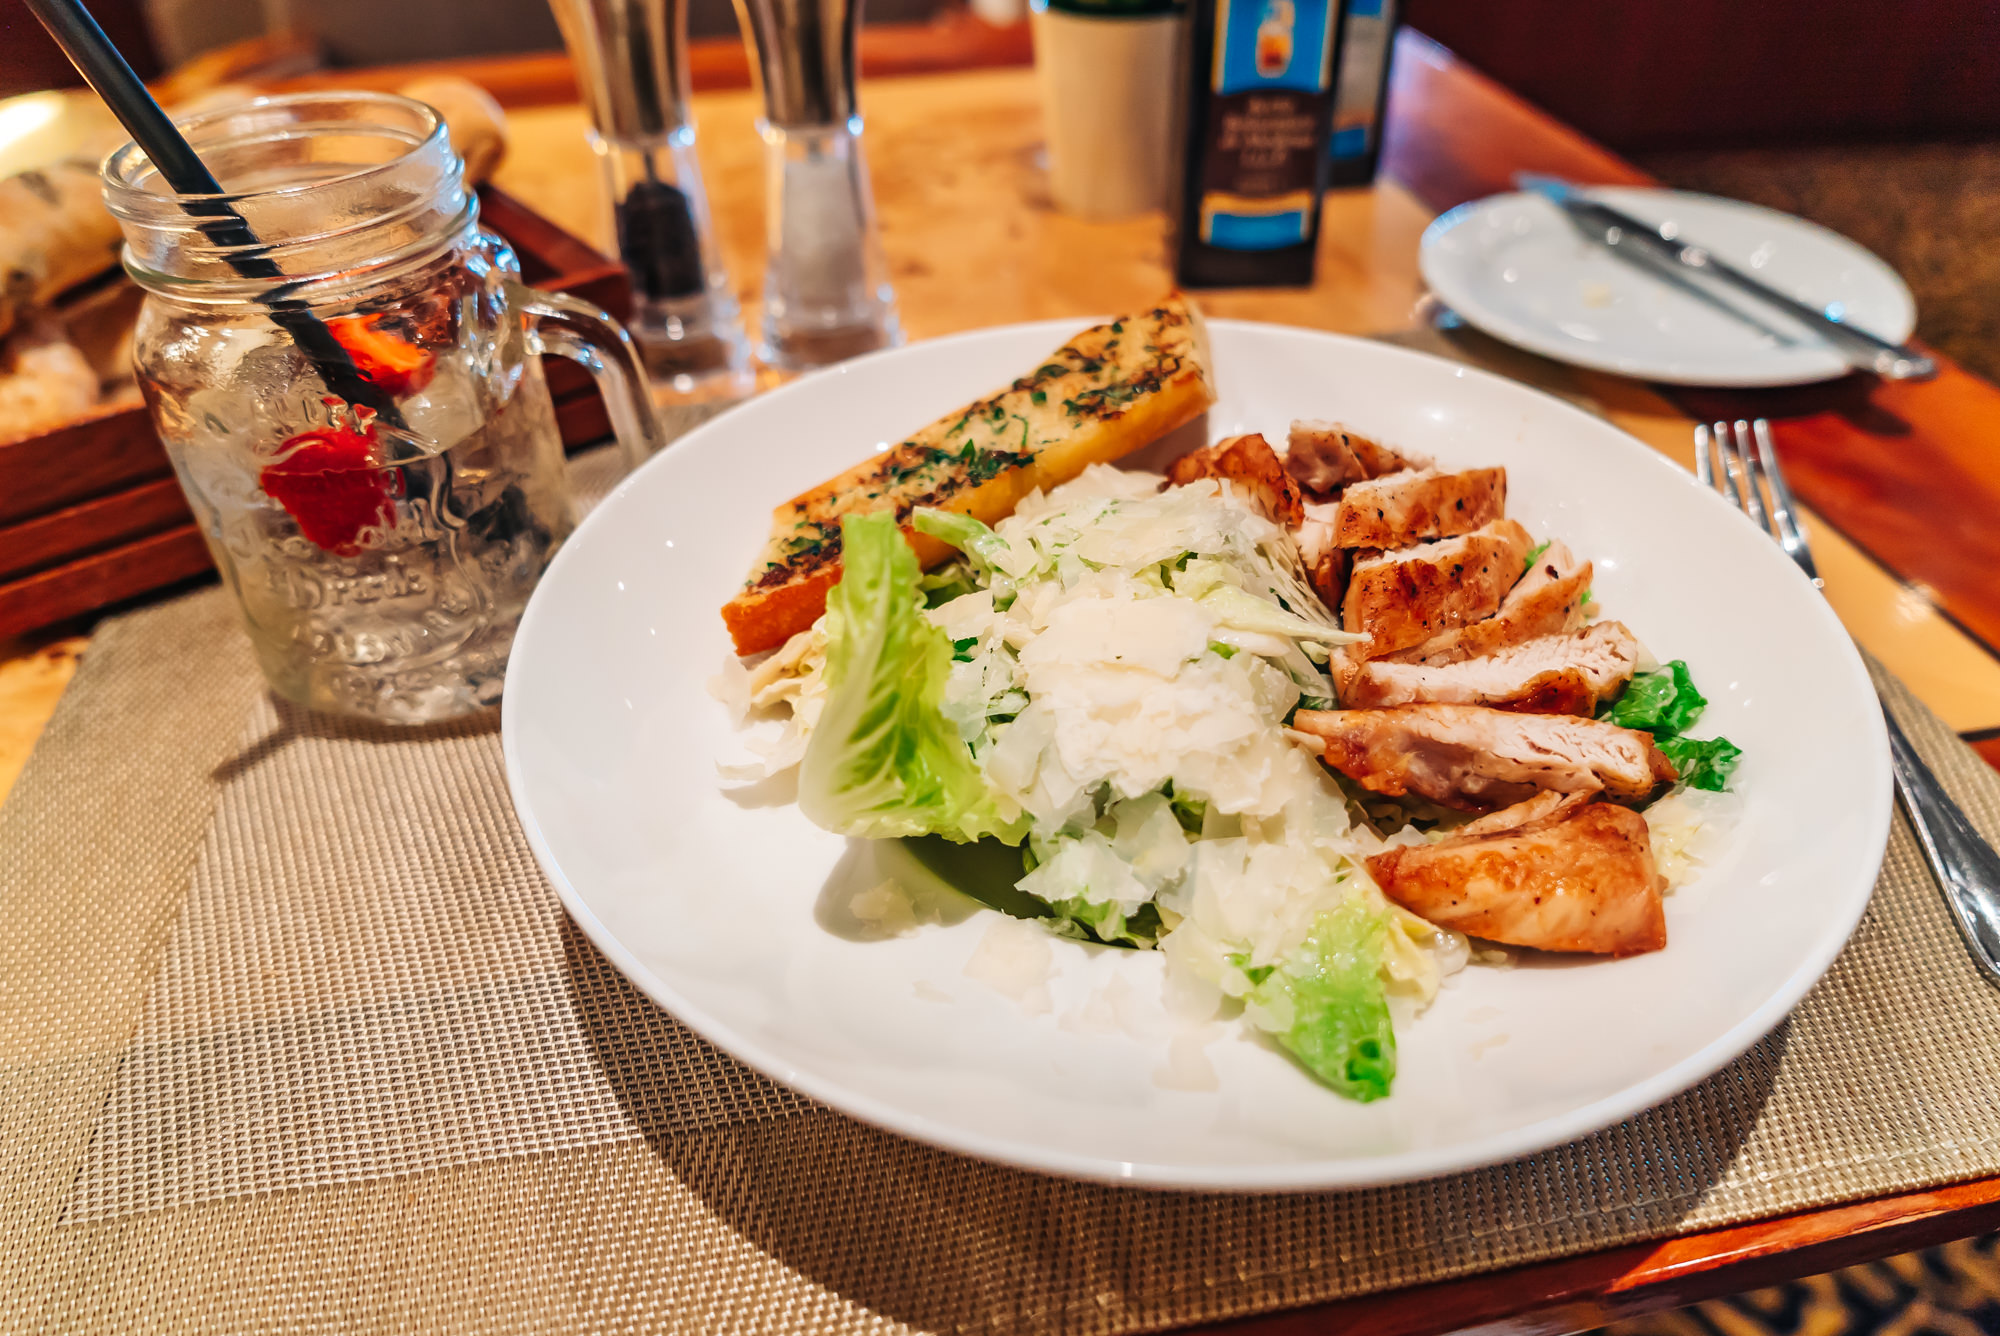 Chicken Caesar Salad at Duke's Bar & Cafe